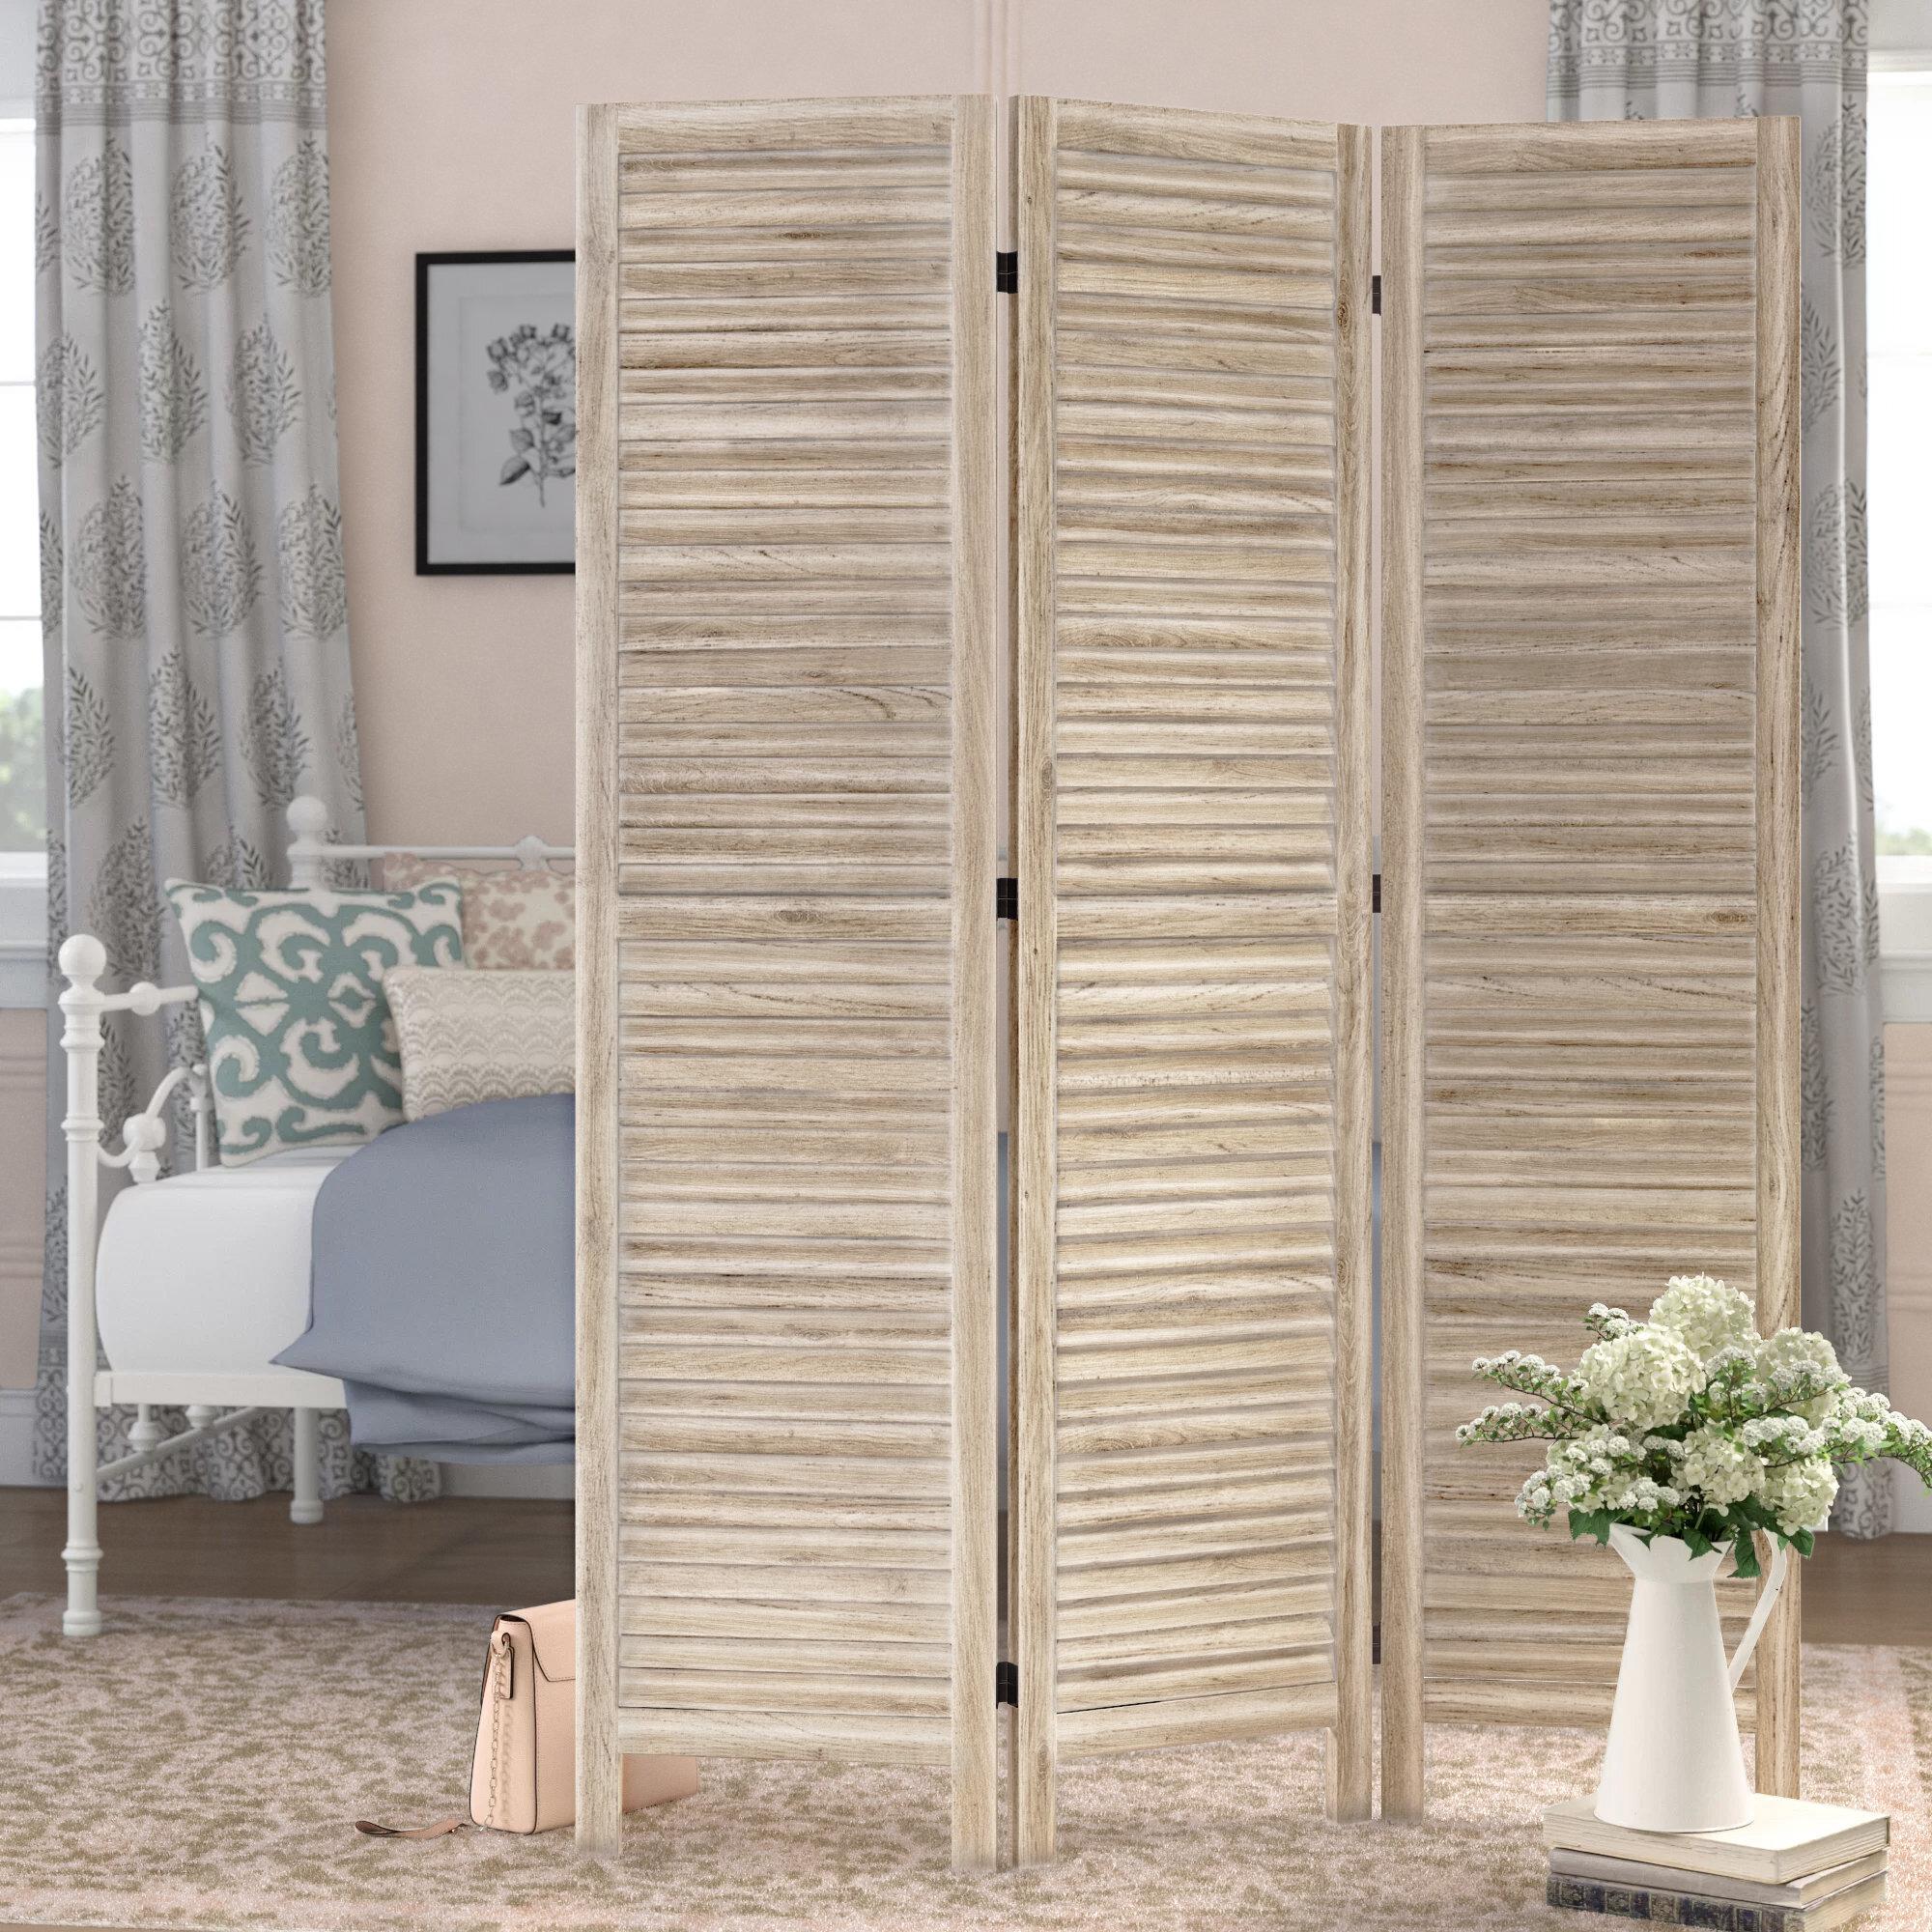 Laurel Foundry Modern Farmhouse Bowersville 50 W X 70 H 3 Panel Wood Folding Room Divider Reviews Wayfair